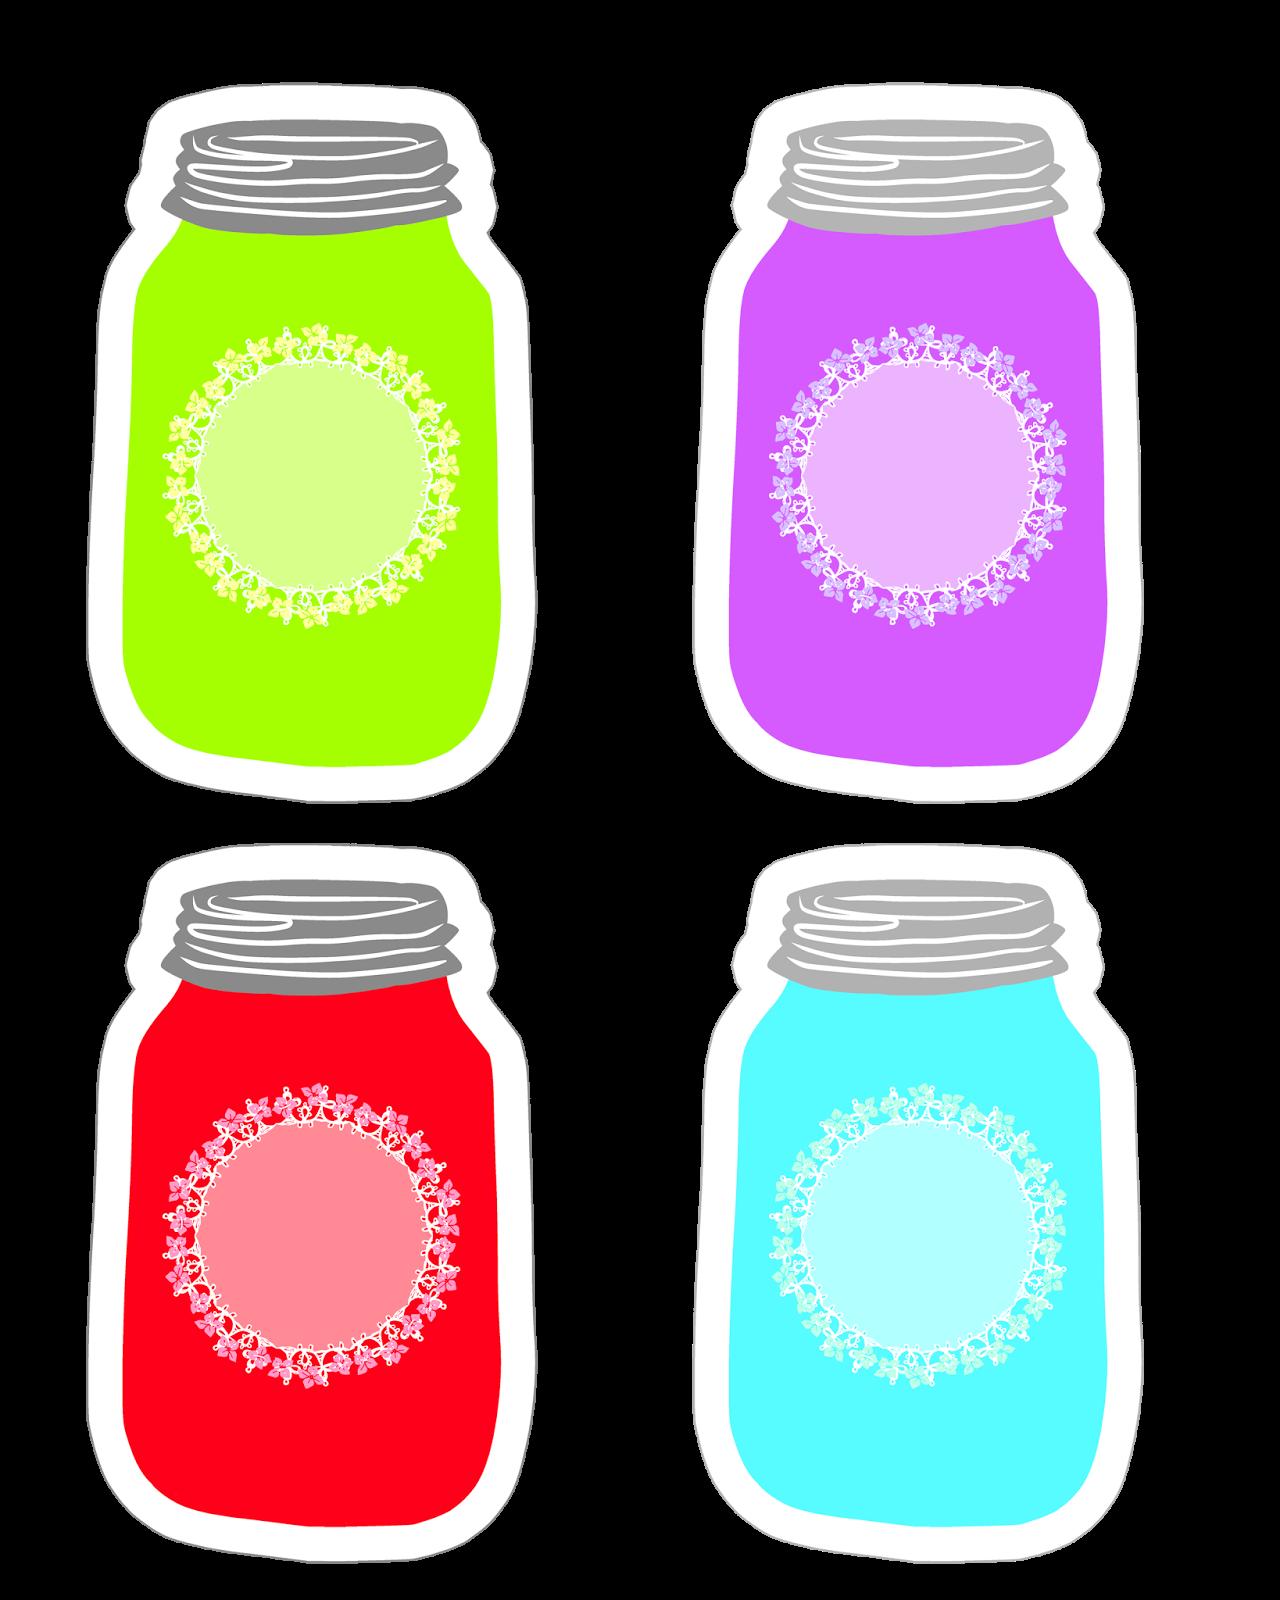 picture transparent download Colorful mason tag collection. Bottle clipart glass jar.